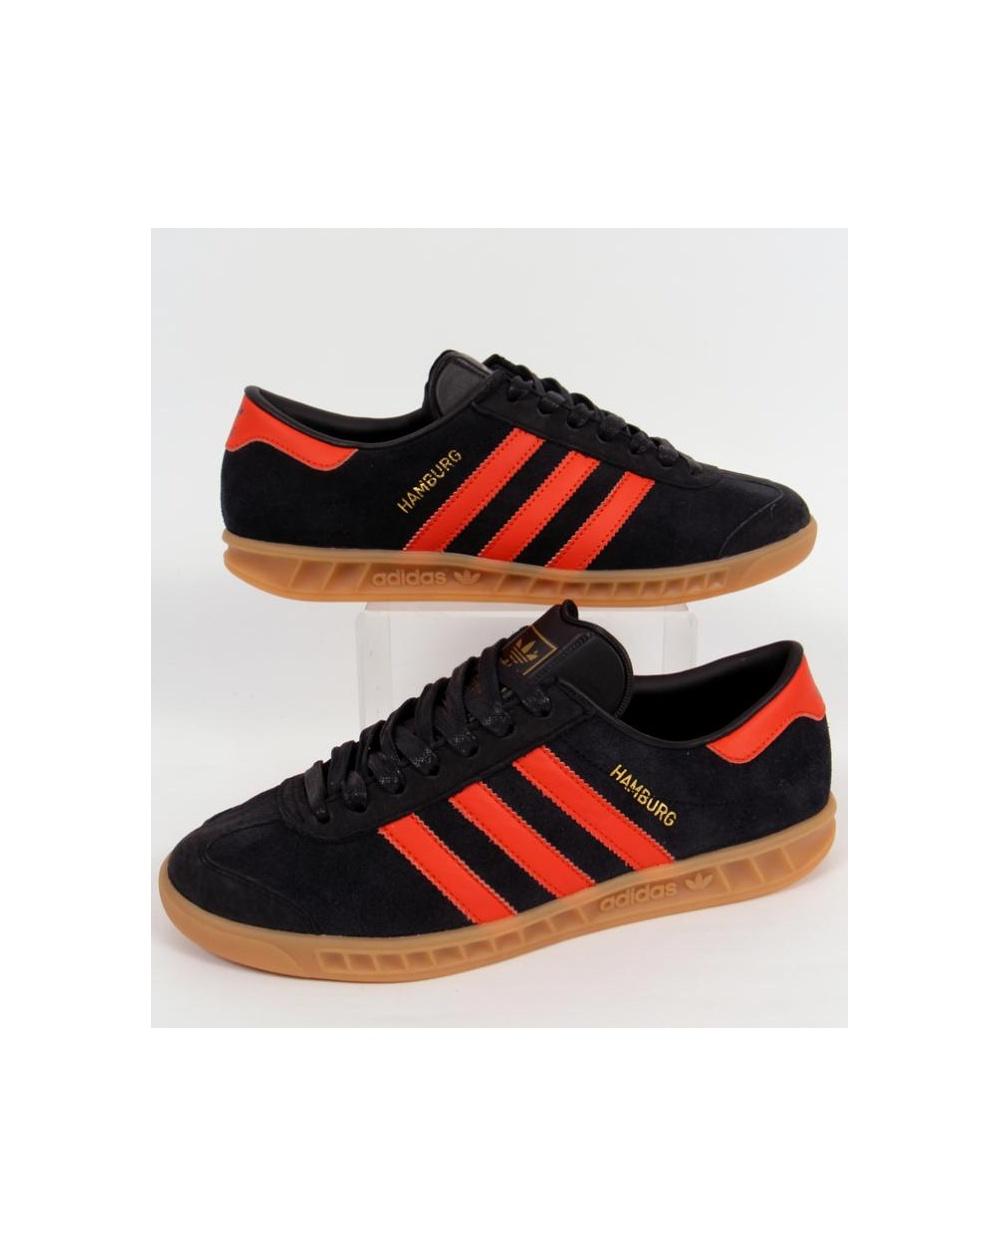 adidas Trainers Adidas Hamburg Trainers Black Orange 2999bbcca3c3